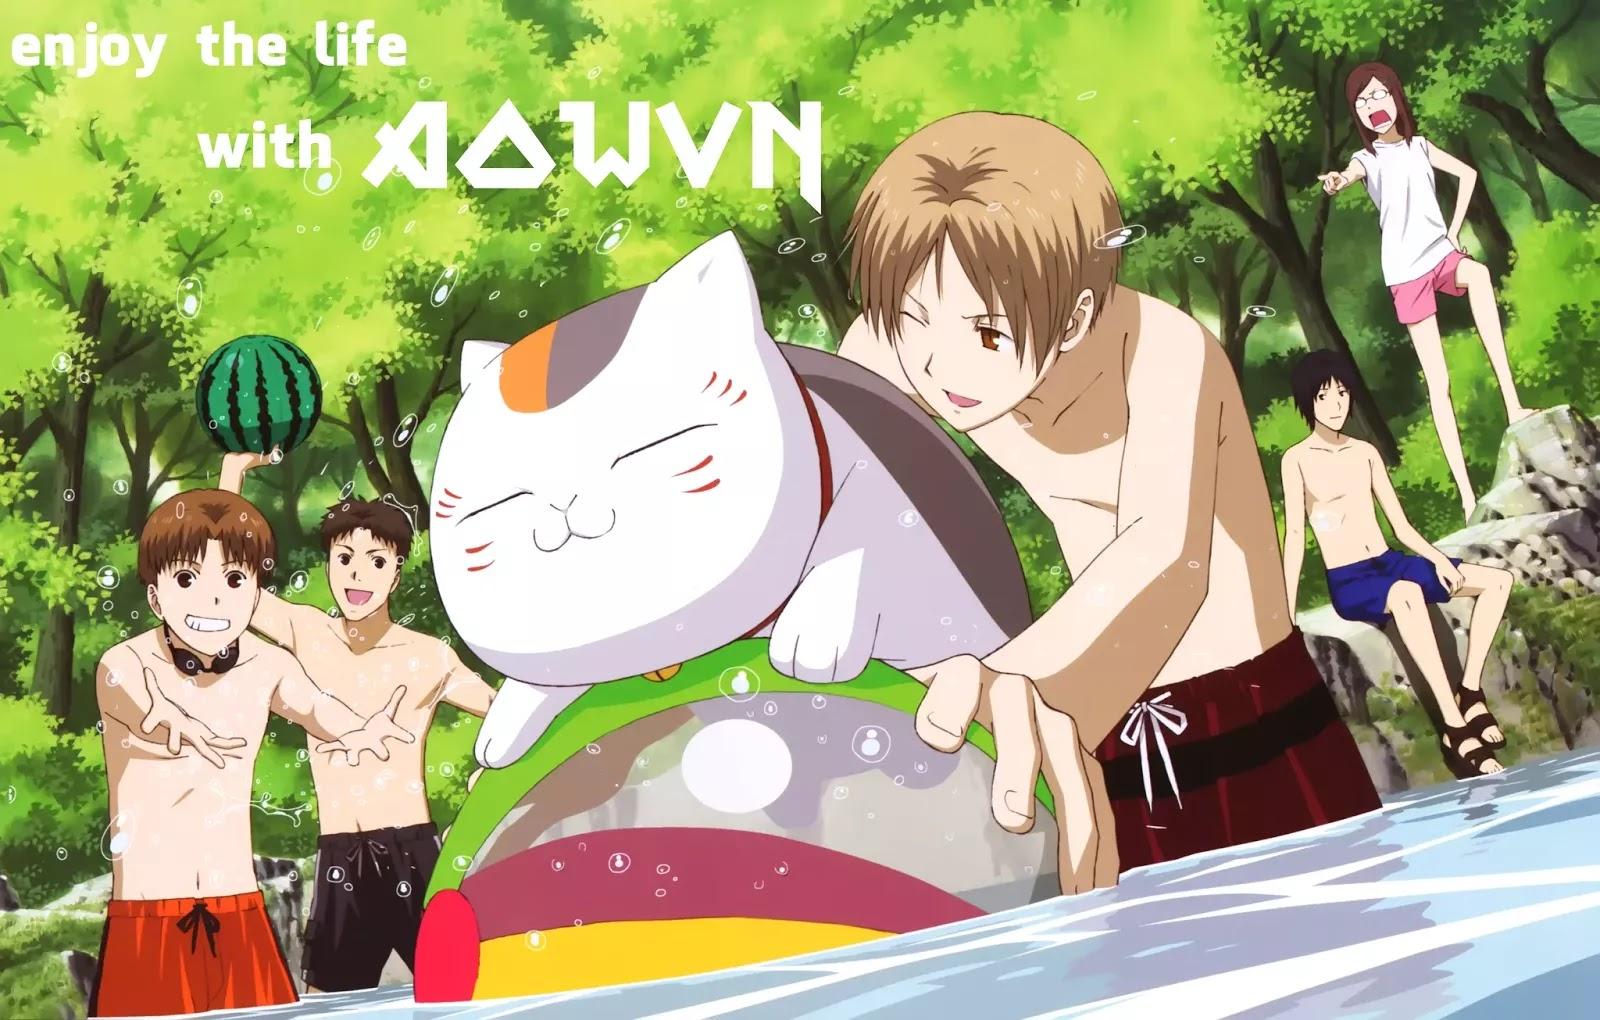 aowvn 2612 - [ Anime 3gp ] Natsume Yuujinchou ss5 | Vietsub - Tiếp nối huyền thoại